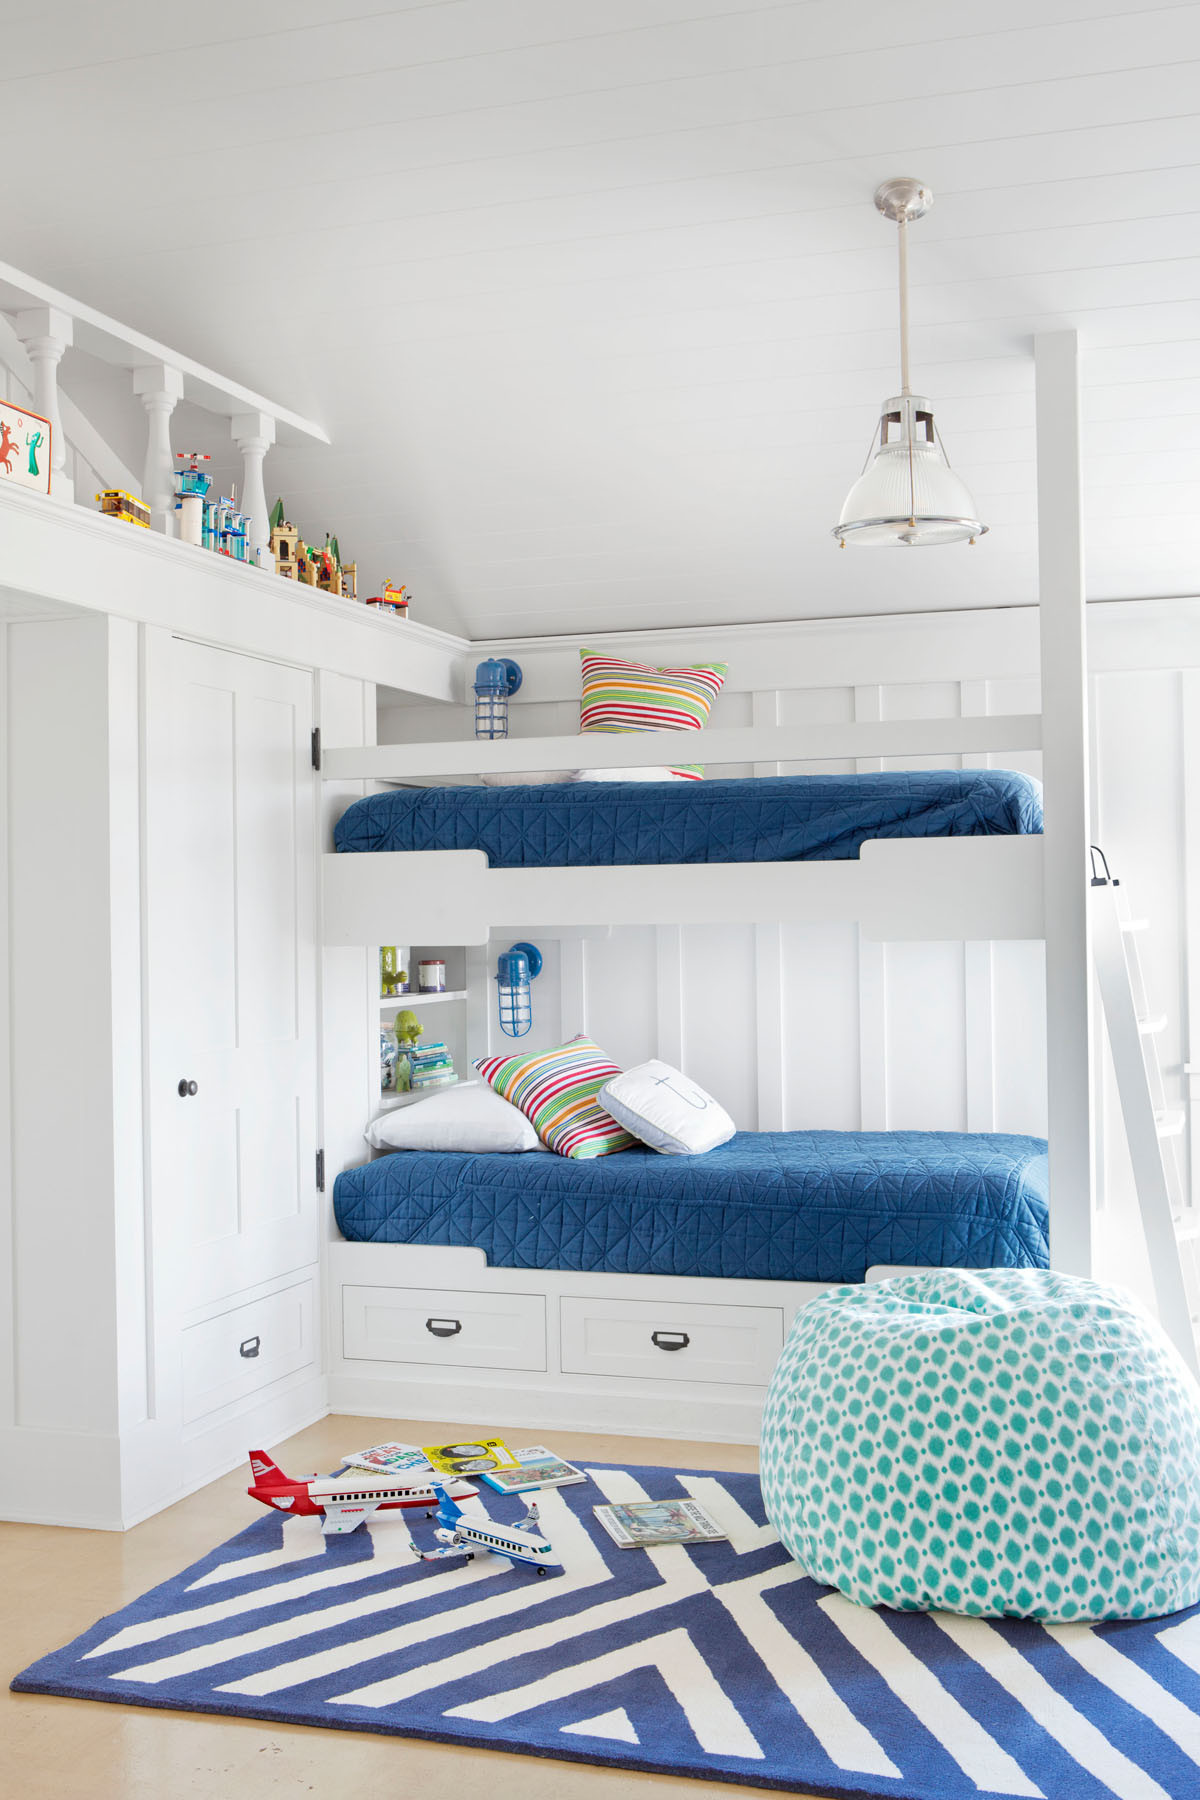 Kids Room Decor Boy  14 Best Boys Bedroom Ideas Room Decor and Themes for a